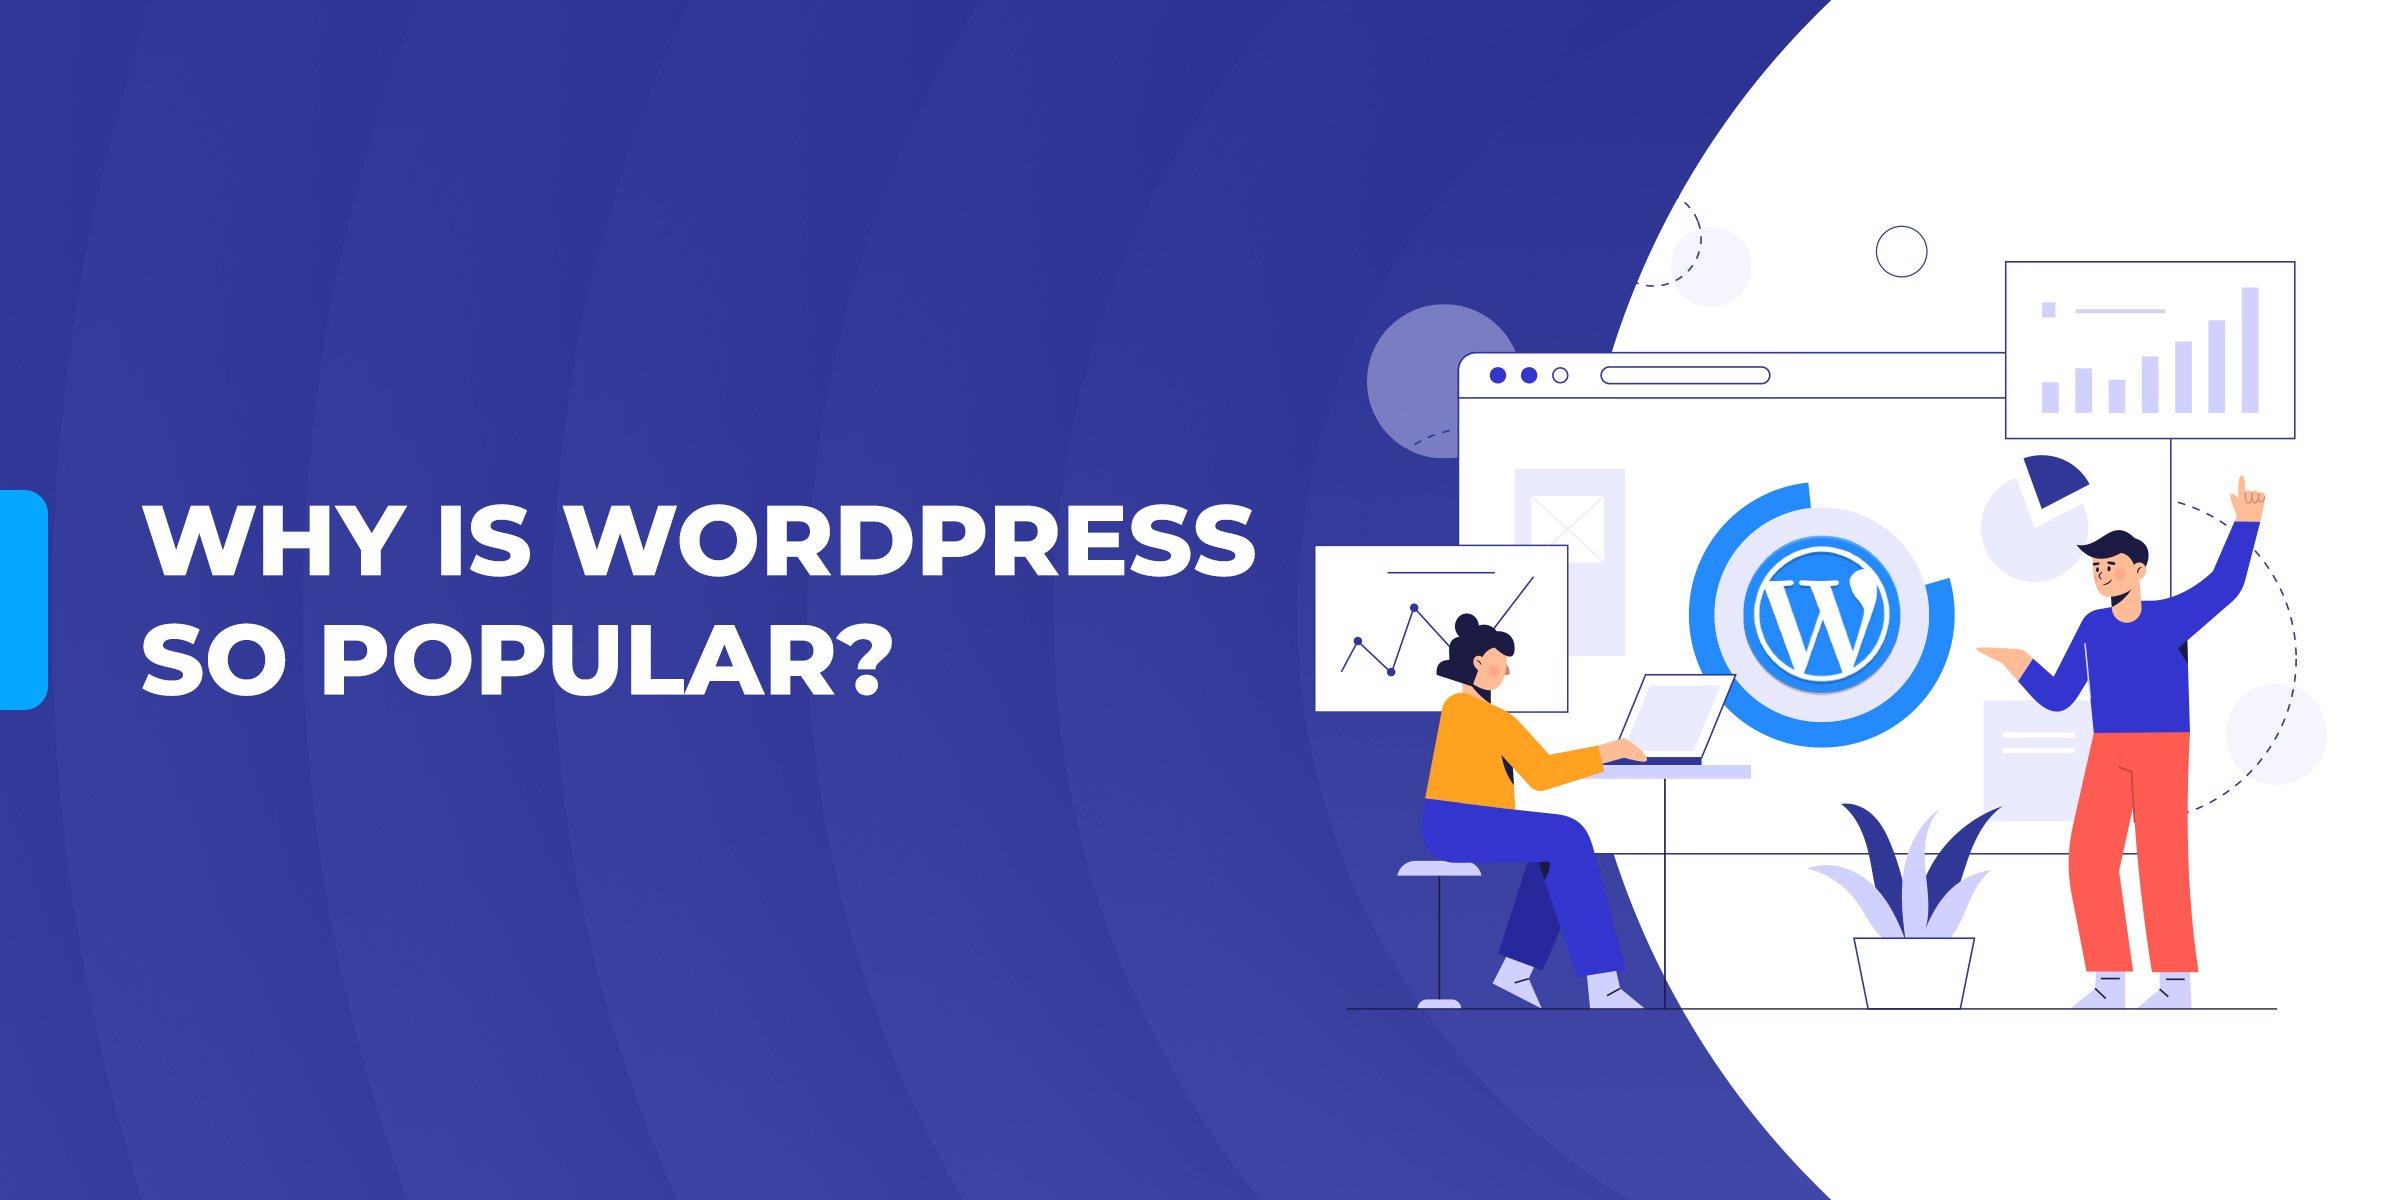 Why is WordPress so popular?